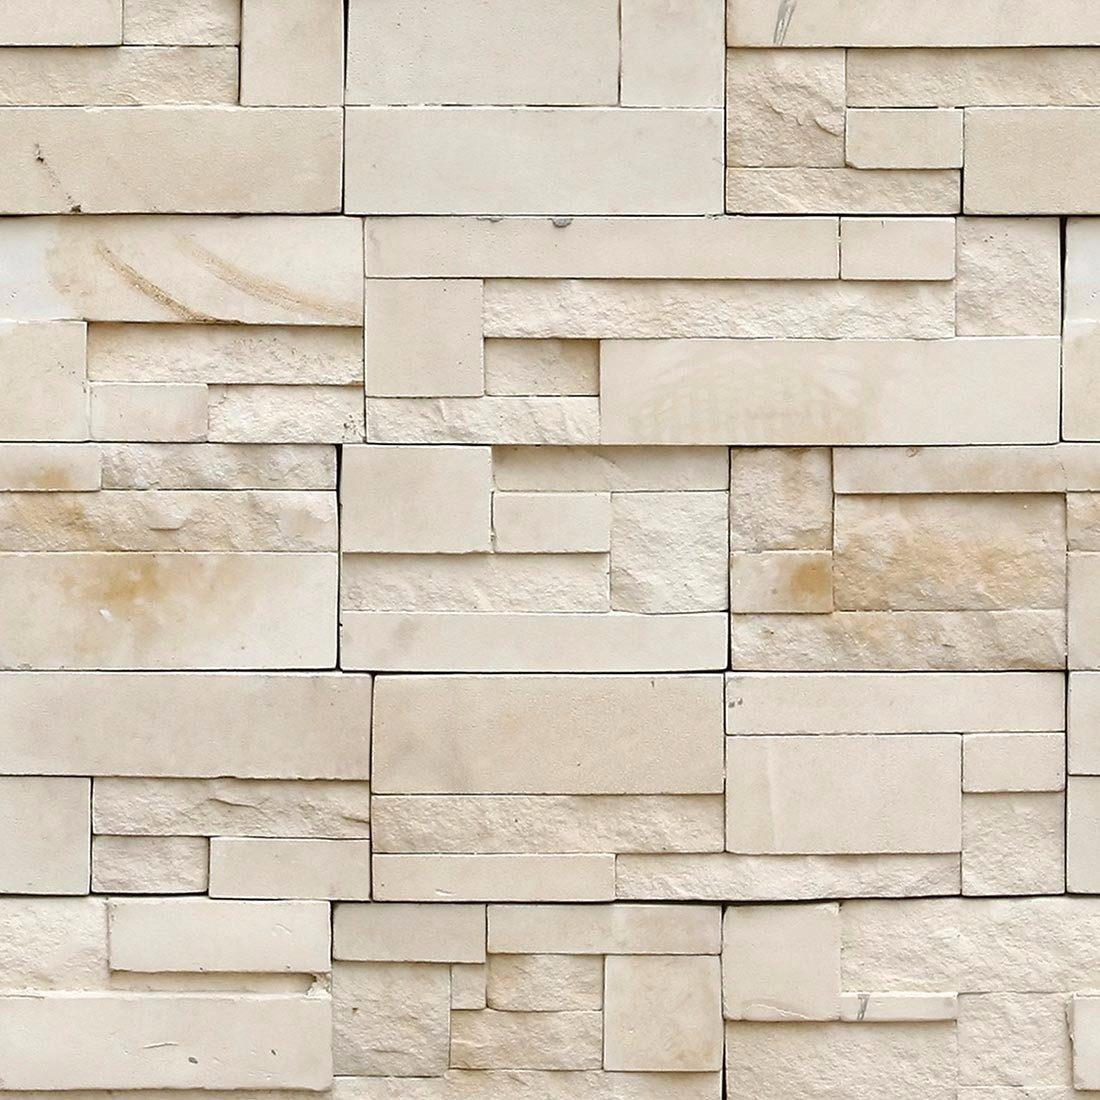 Loja Artesanato Zona Sul ~ Adesivo De Parede Rustico Pedra Discreta Lavável Sala 10 Met R$ 162,79 em Mercado Livre